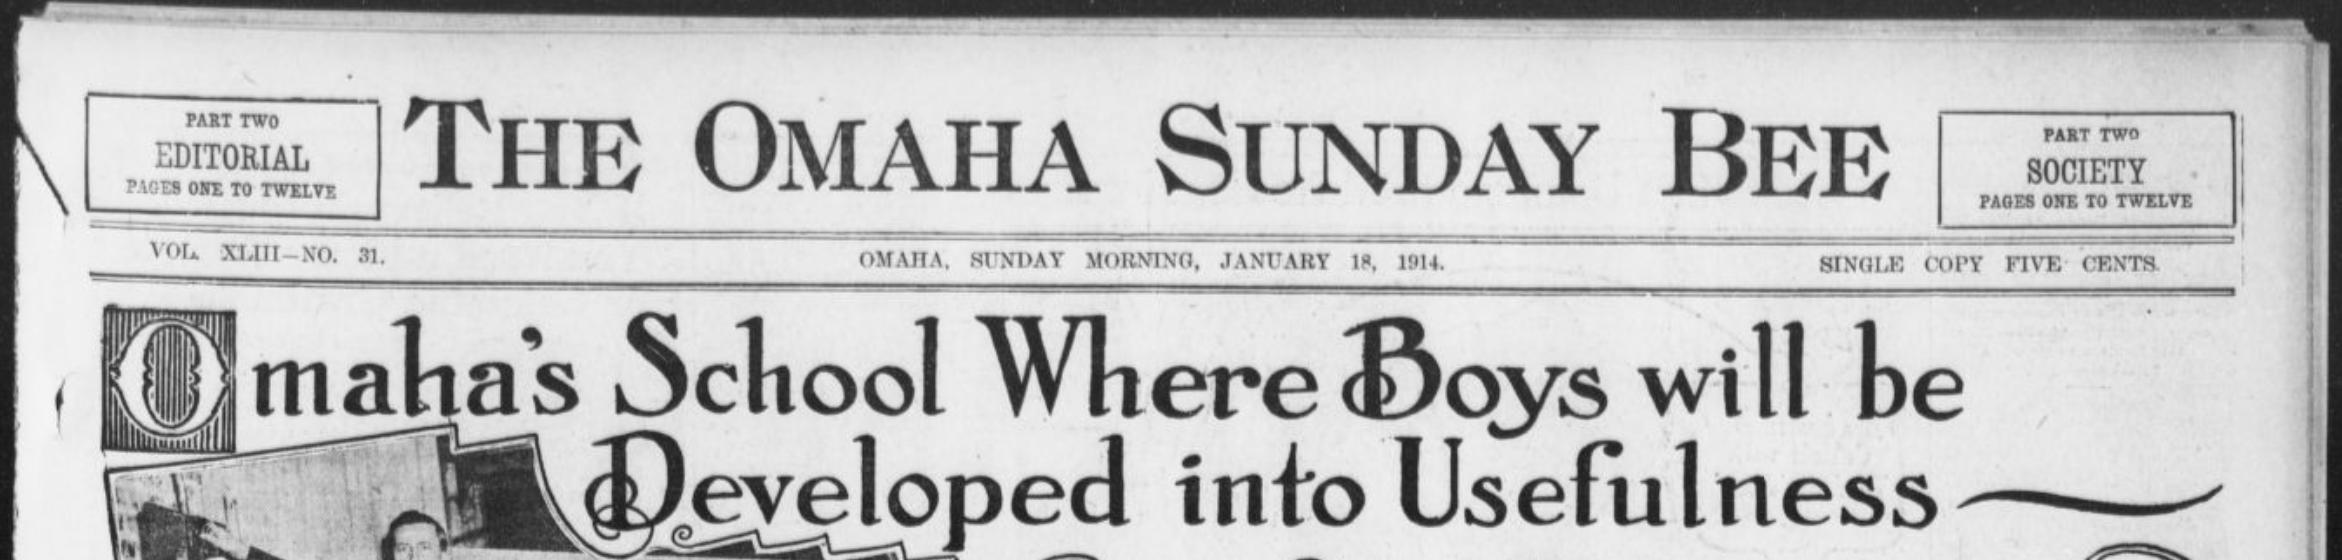 omaha fort street special school 1914 Omaha Bee headline